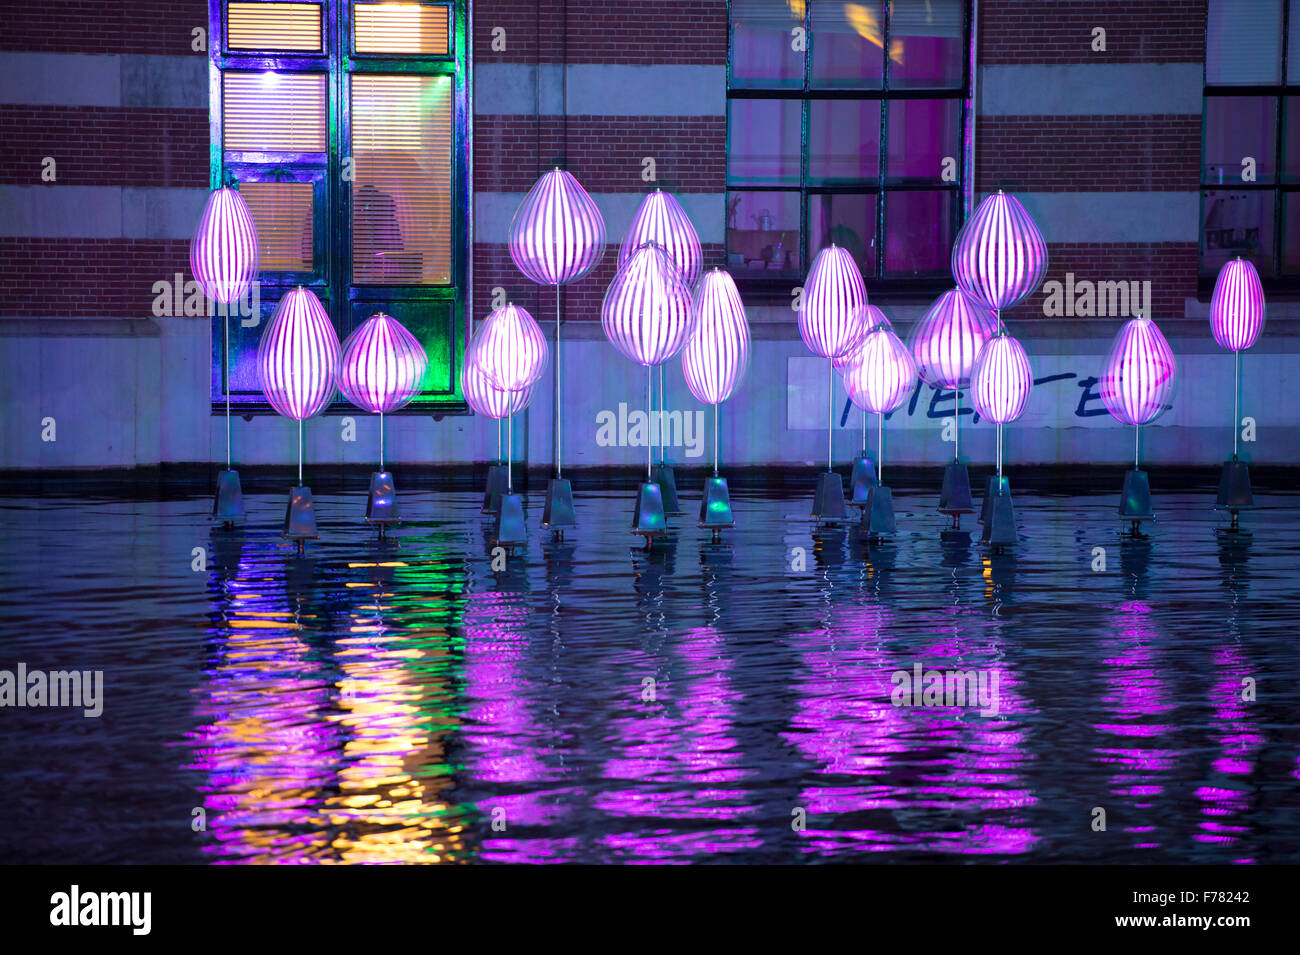 Amsterdam, The Netherlands, 26th November 2015: Holon Light, by Michiel Martens & Jetske Visser, at the fourth annual Stock Photo